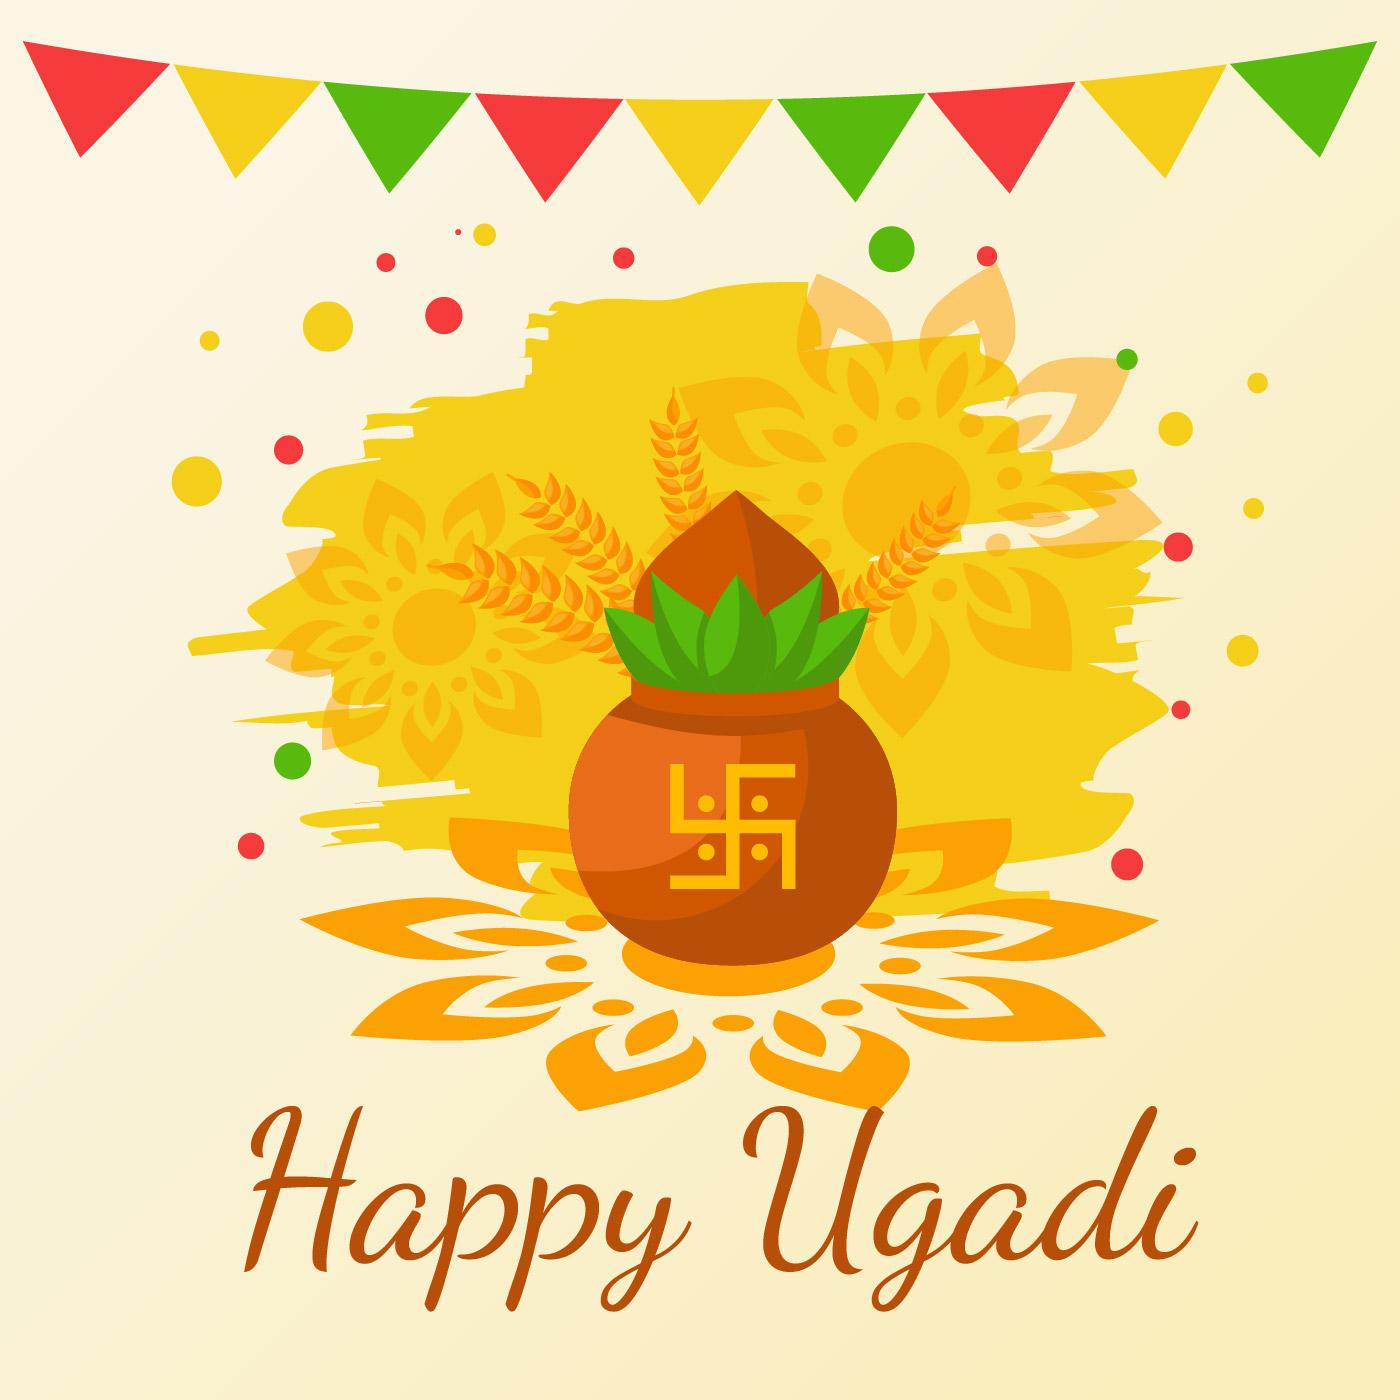 Hindu New Year Free Vector Art 8238 Free Downloads